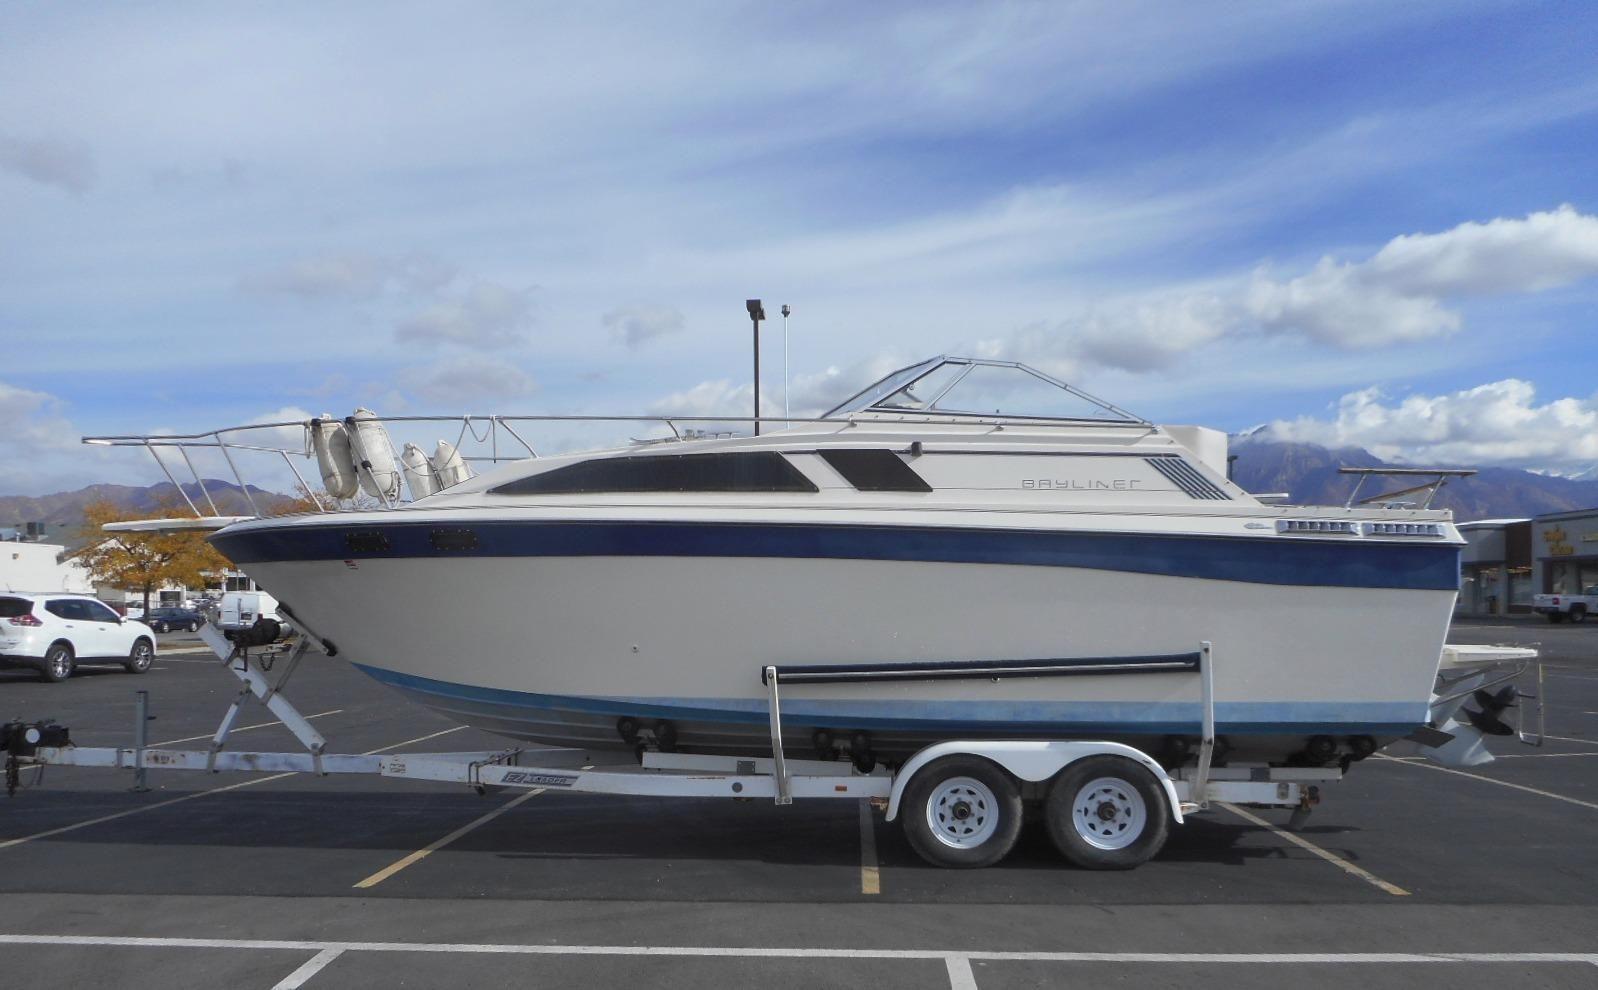 1984 Bayliner Ciera 2750 Sunbridge Power Boat For Sale ...